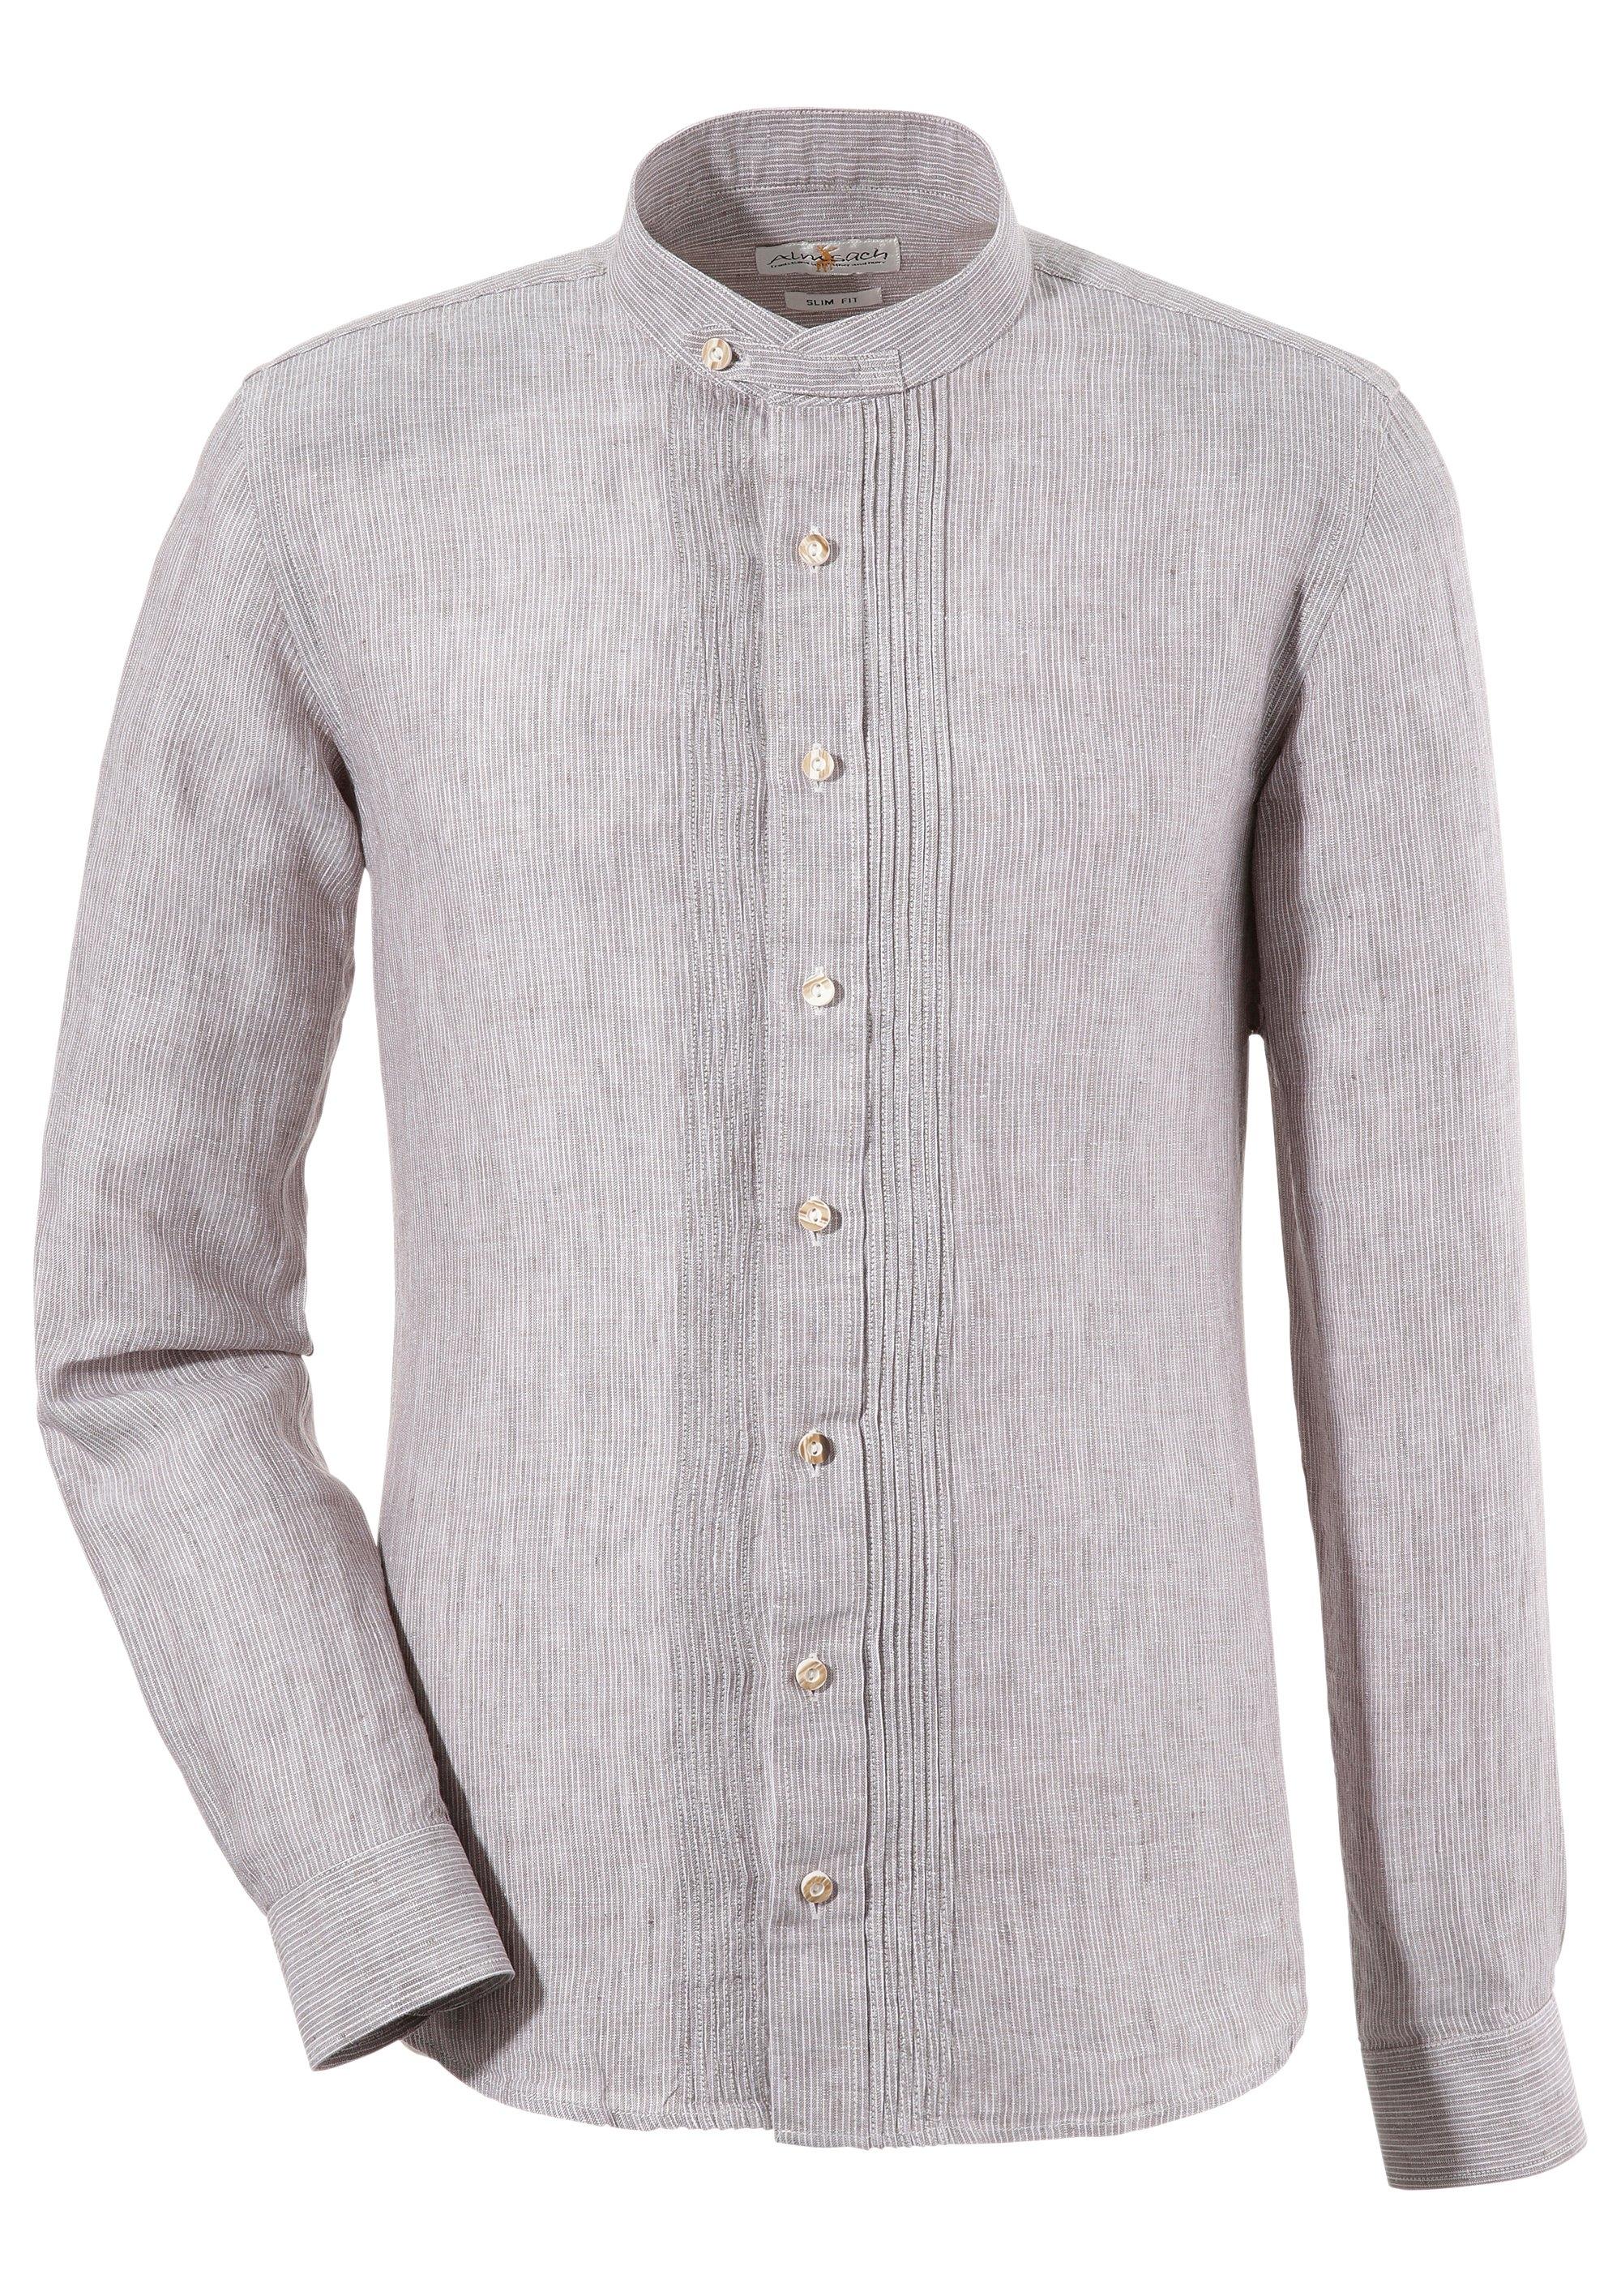 Almsach folklore-overhemd, smal model nu online kopen bij OTTO